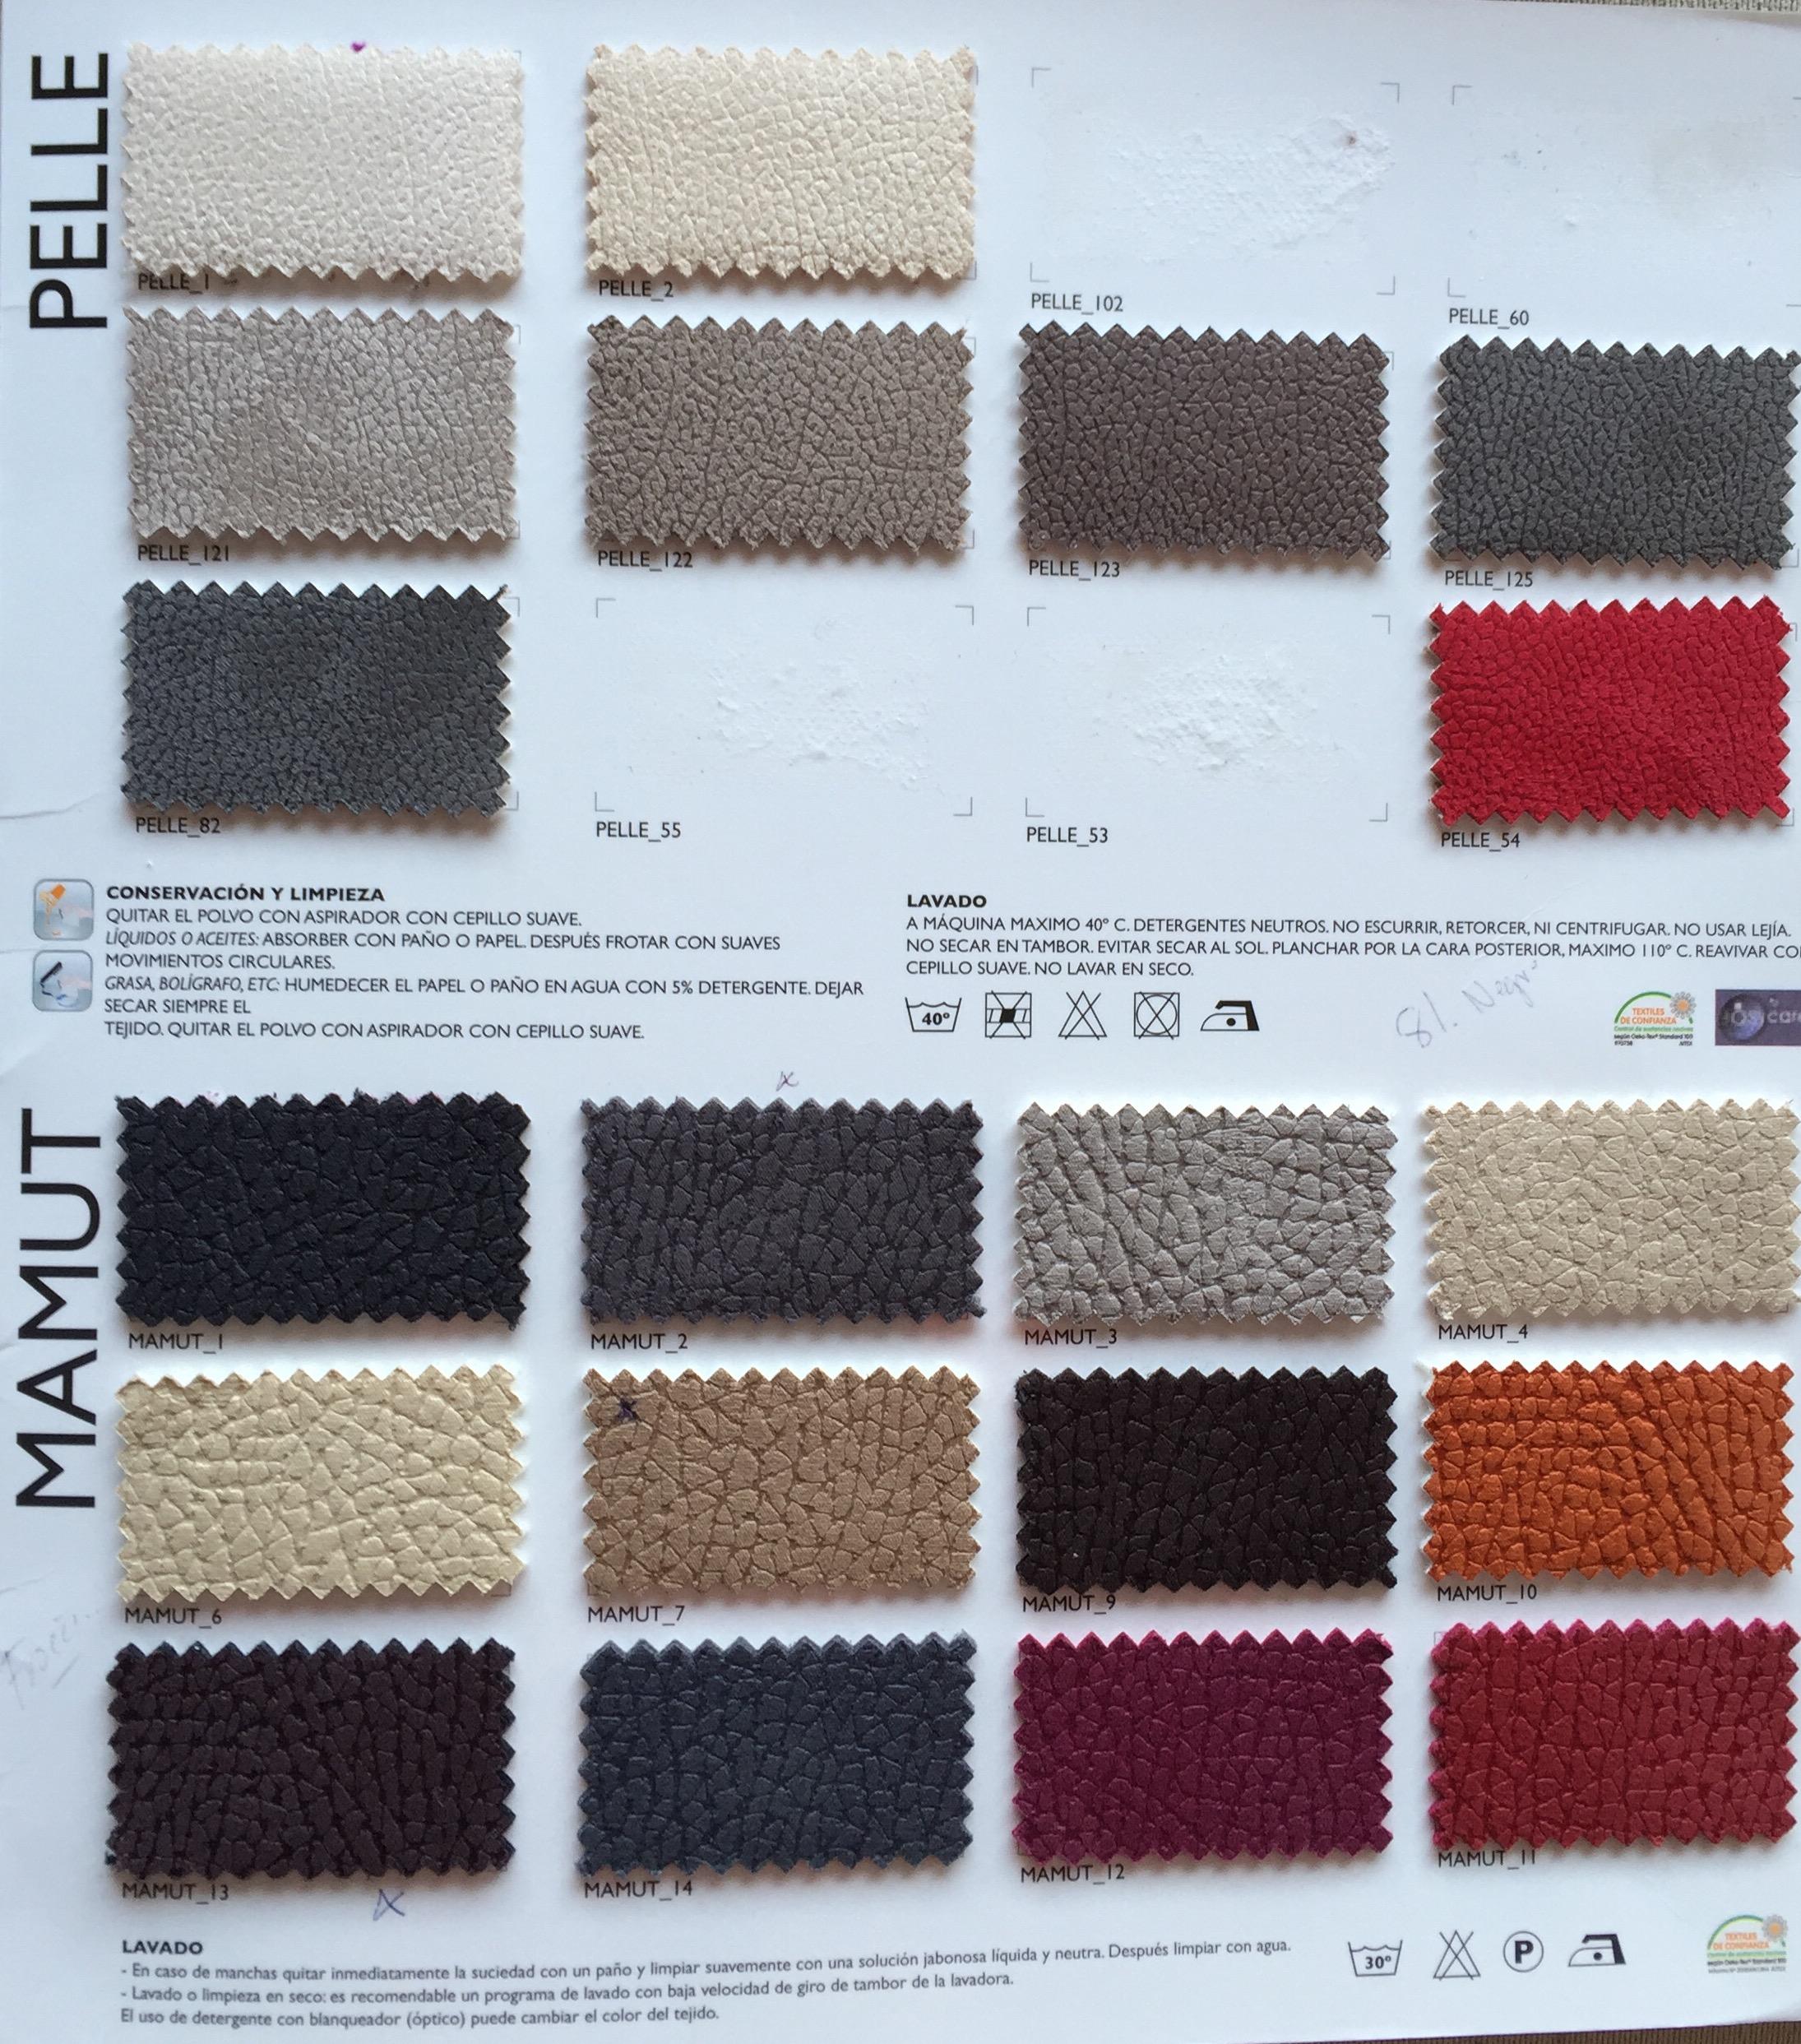 Como limpiar tapiceria sofa latest cuidar las tapicerias for Como limpiar sofa de tela muy sucio